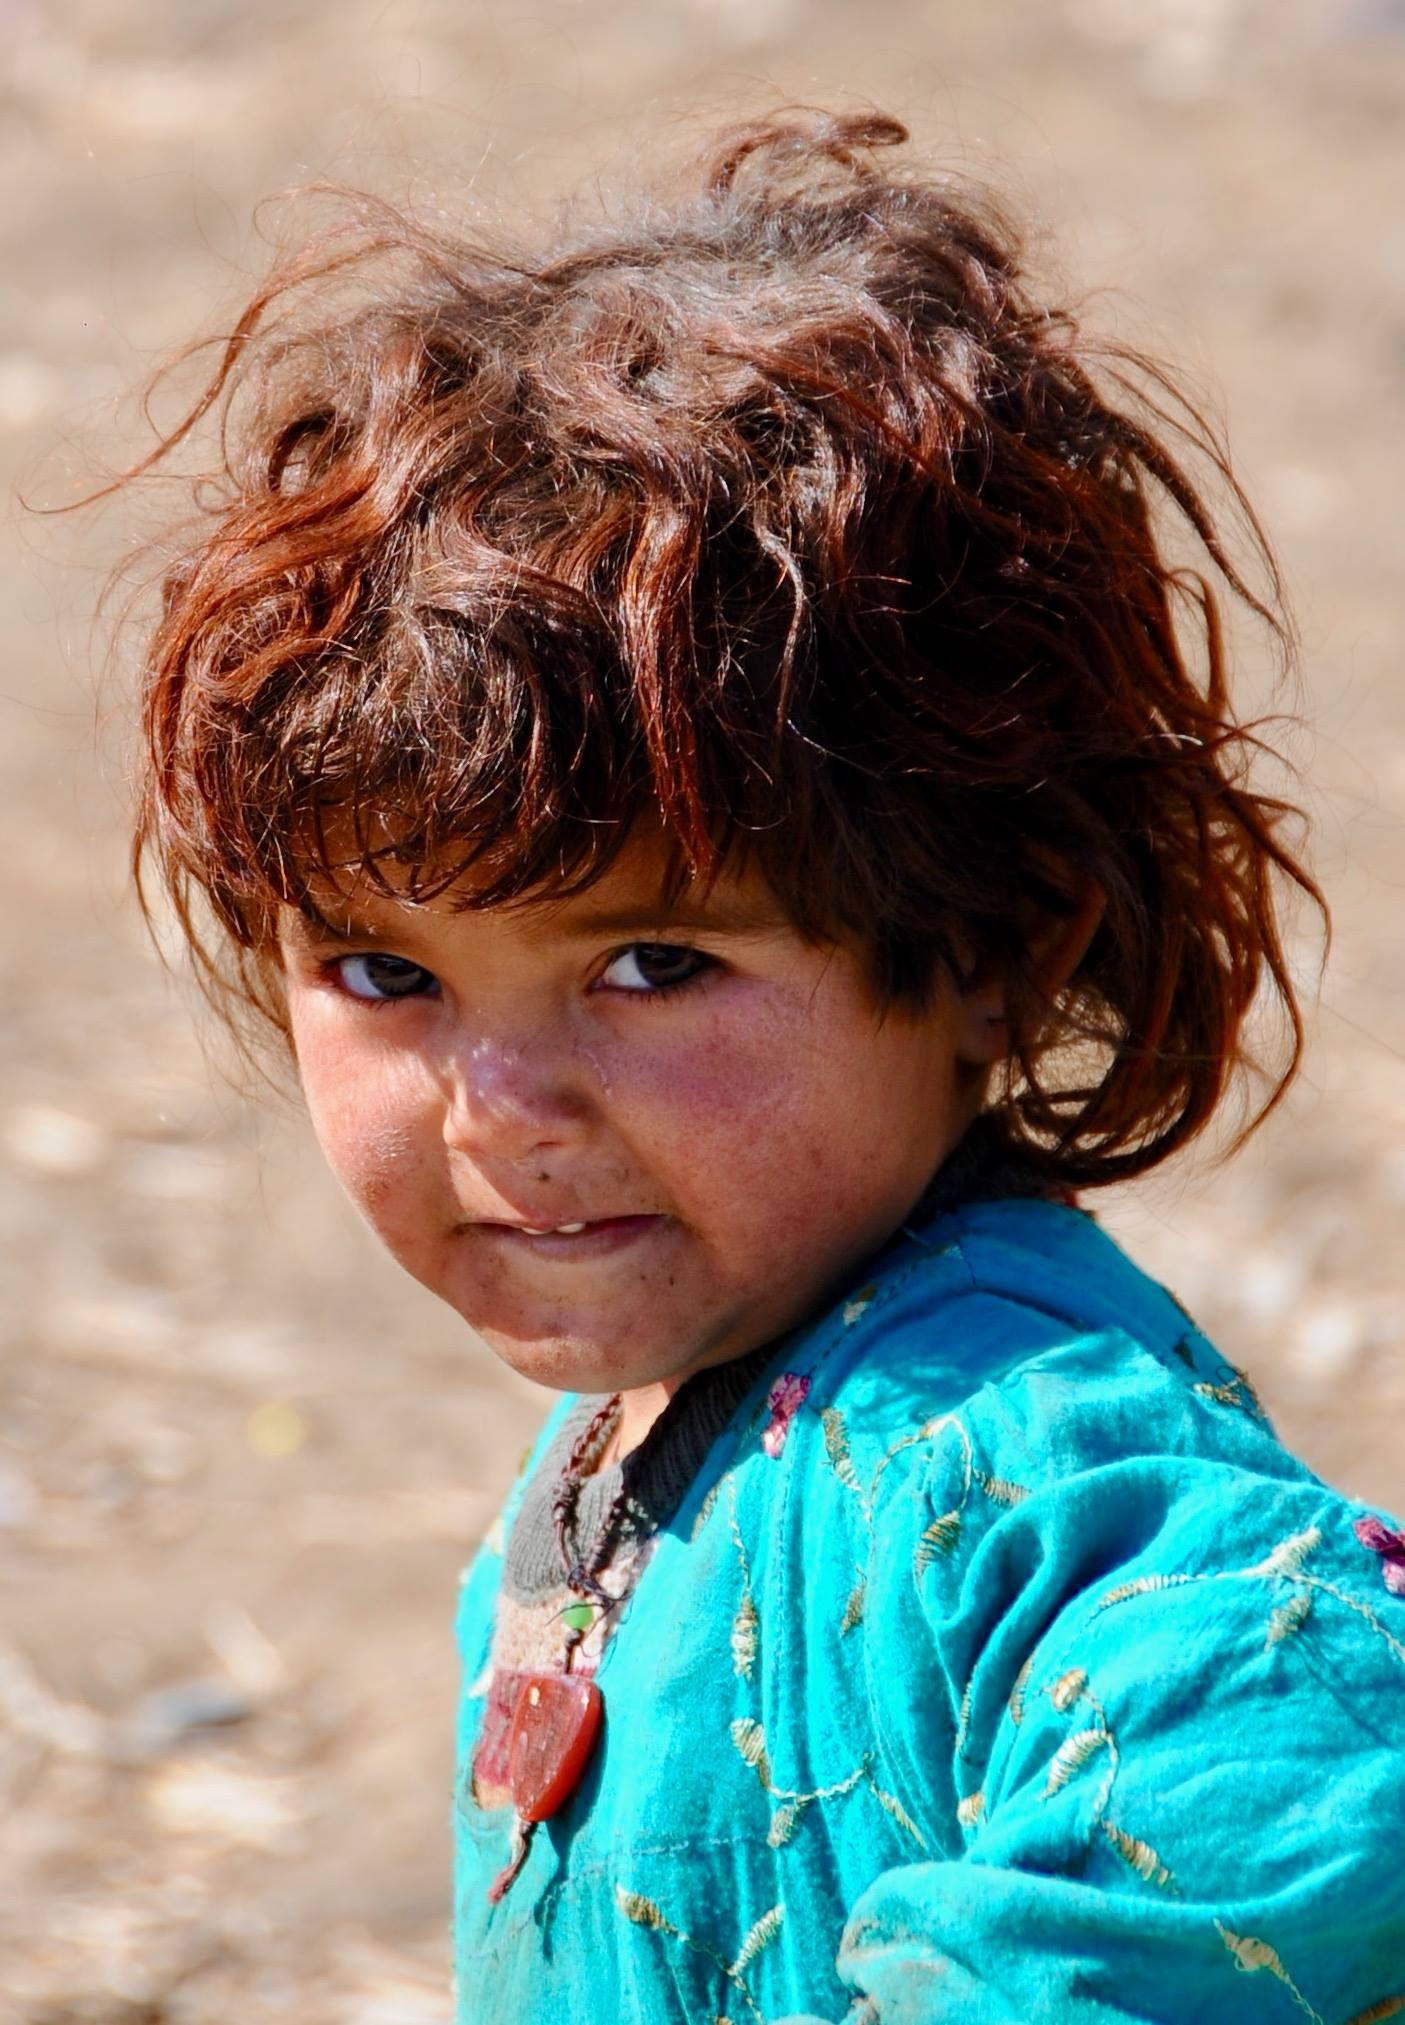 Afghan child - Bamiyan 2018 by Robert Malin Young